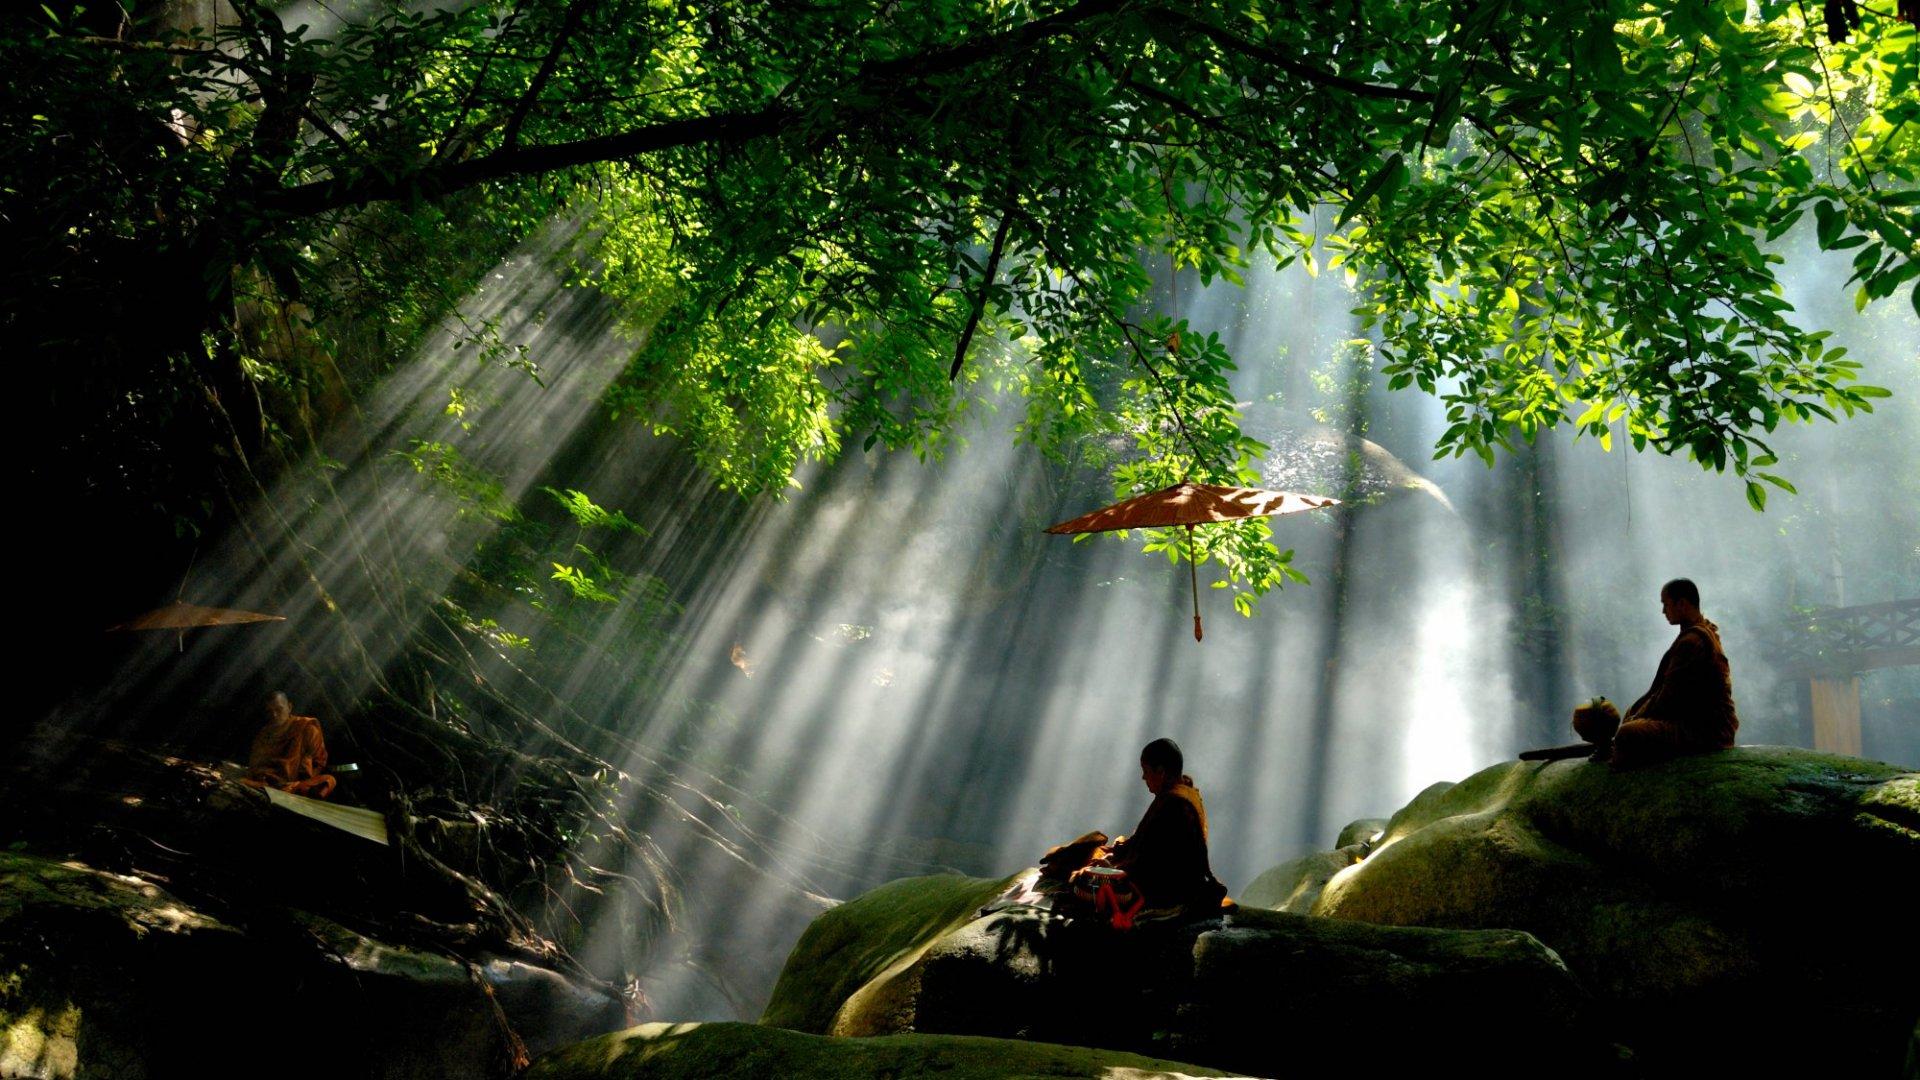 5 Best Meditation Apps to Find Your Inner Calmness